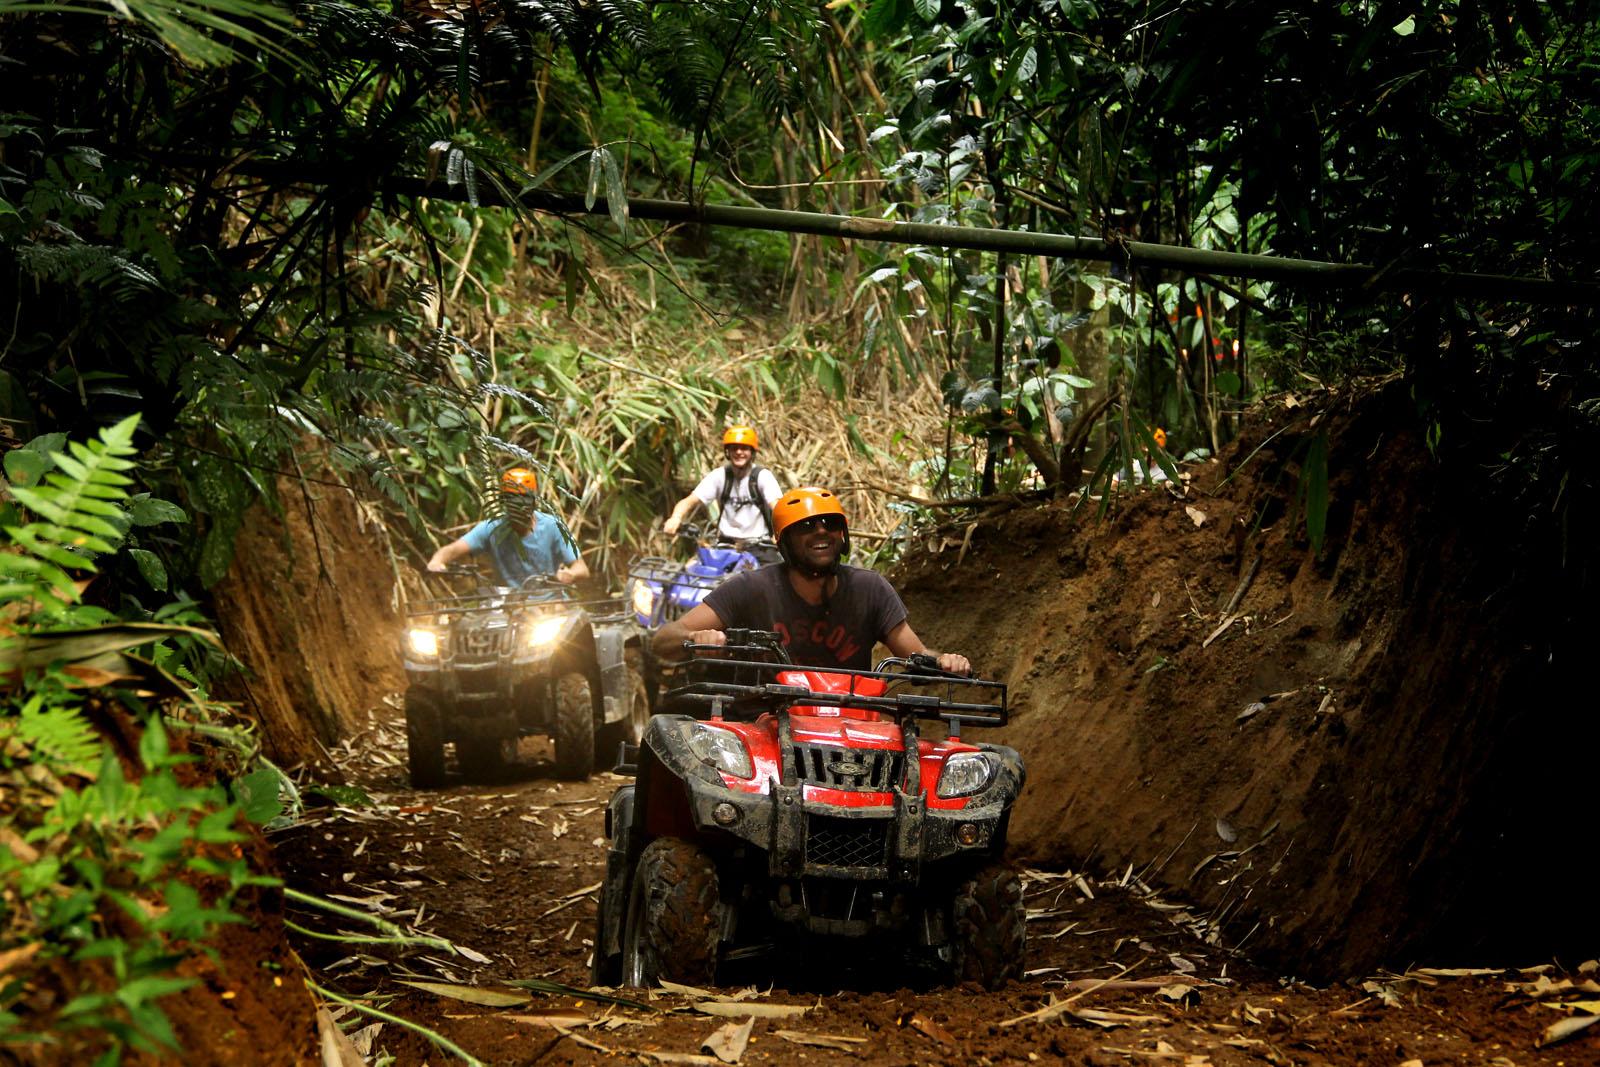 Panama Adventure Tours For Bachelor Parties